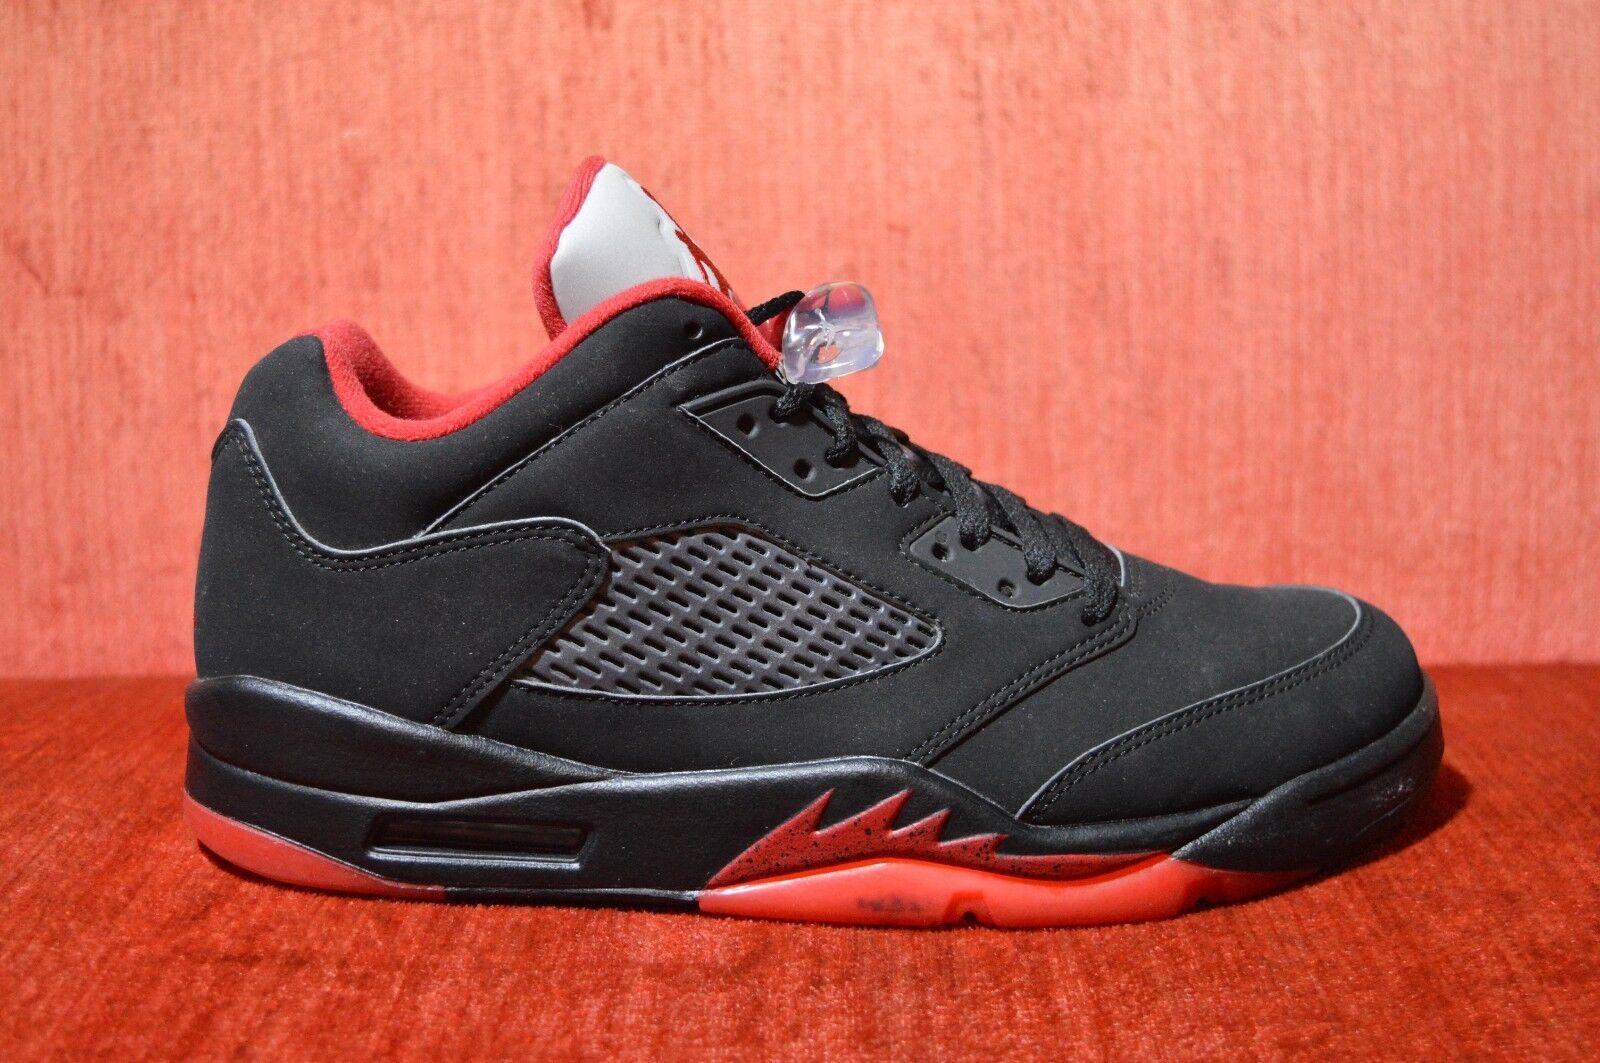 info for 0a7f5 2ebcb WORN 2X Nike Air Air Air Jordan 5 V Retro Low Alternate 90 Black Red Size